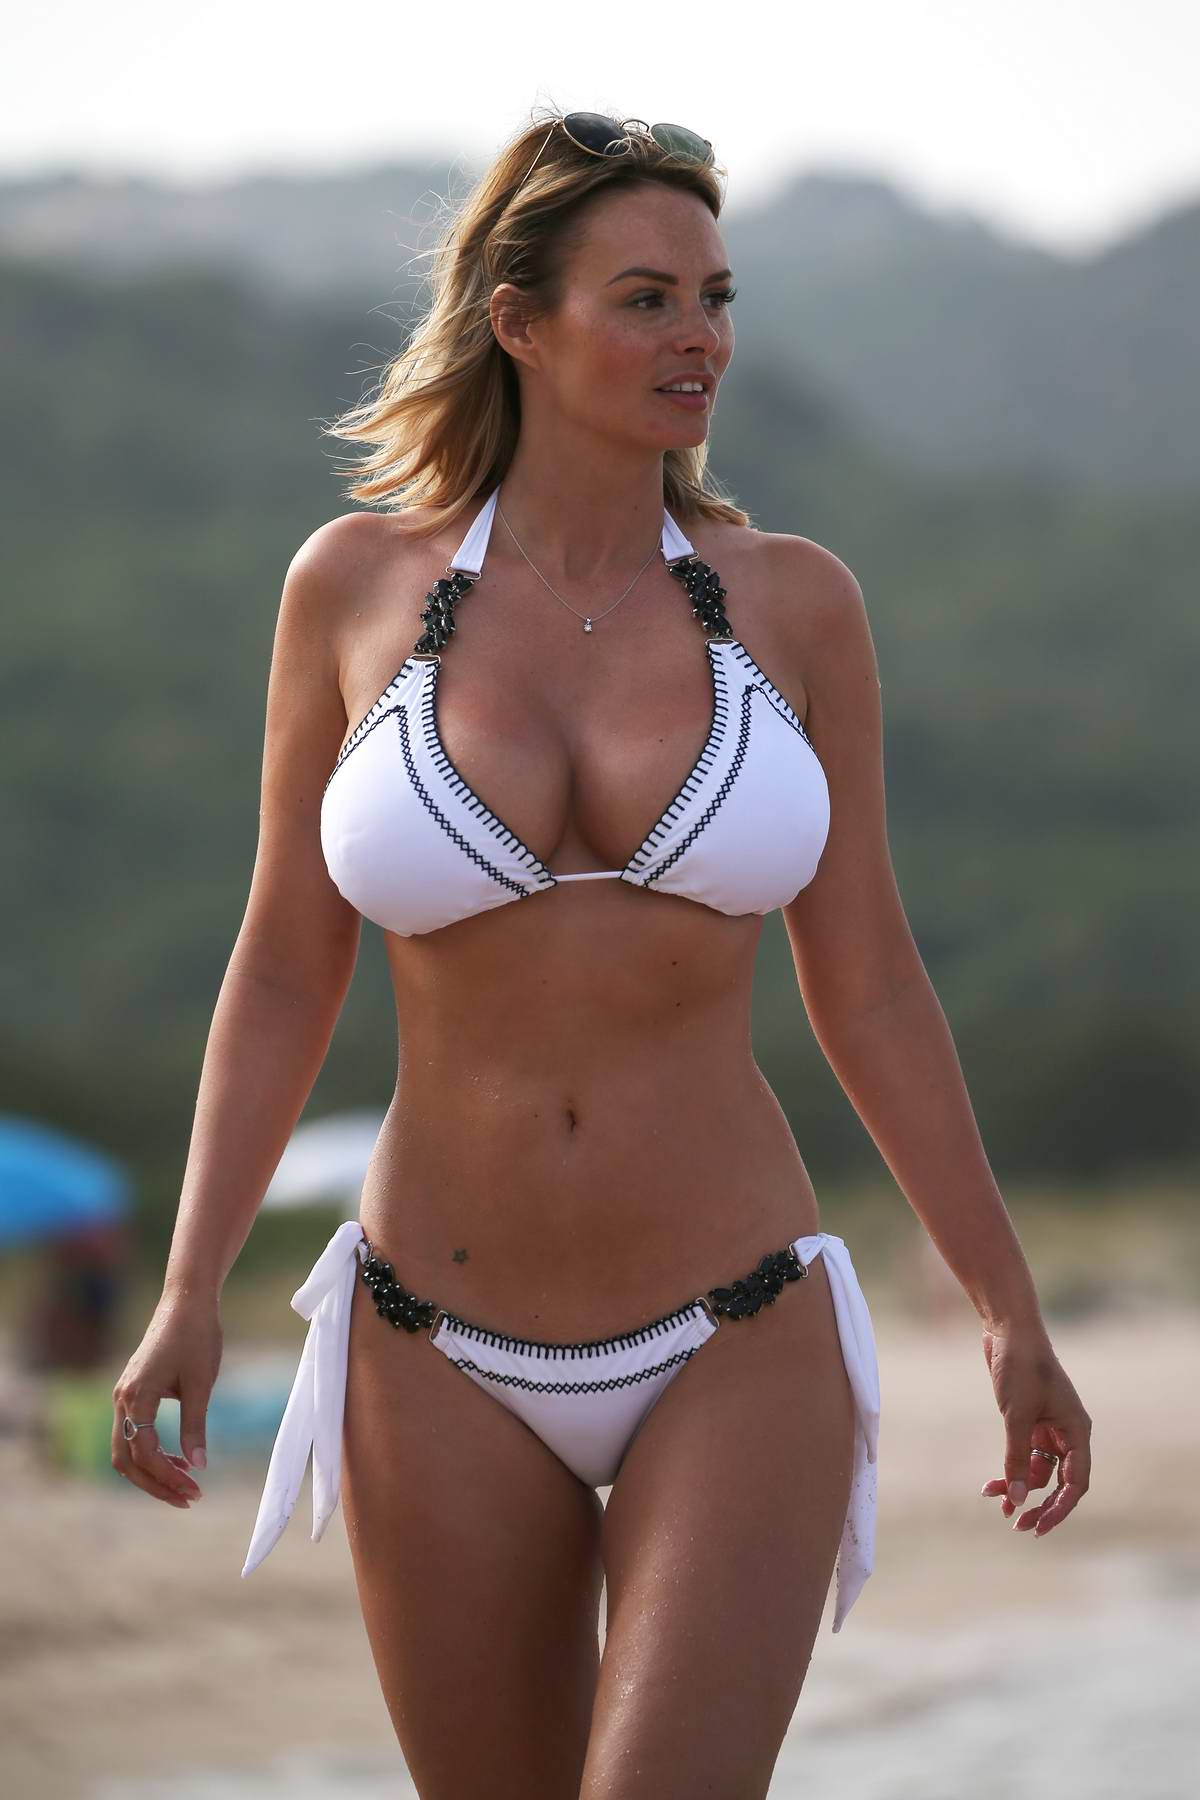 Rhian Sugden Seen Wearing A White Bikini While At The -2982